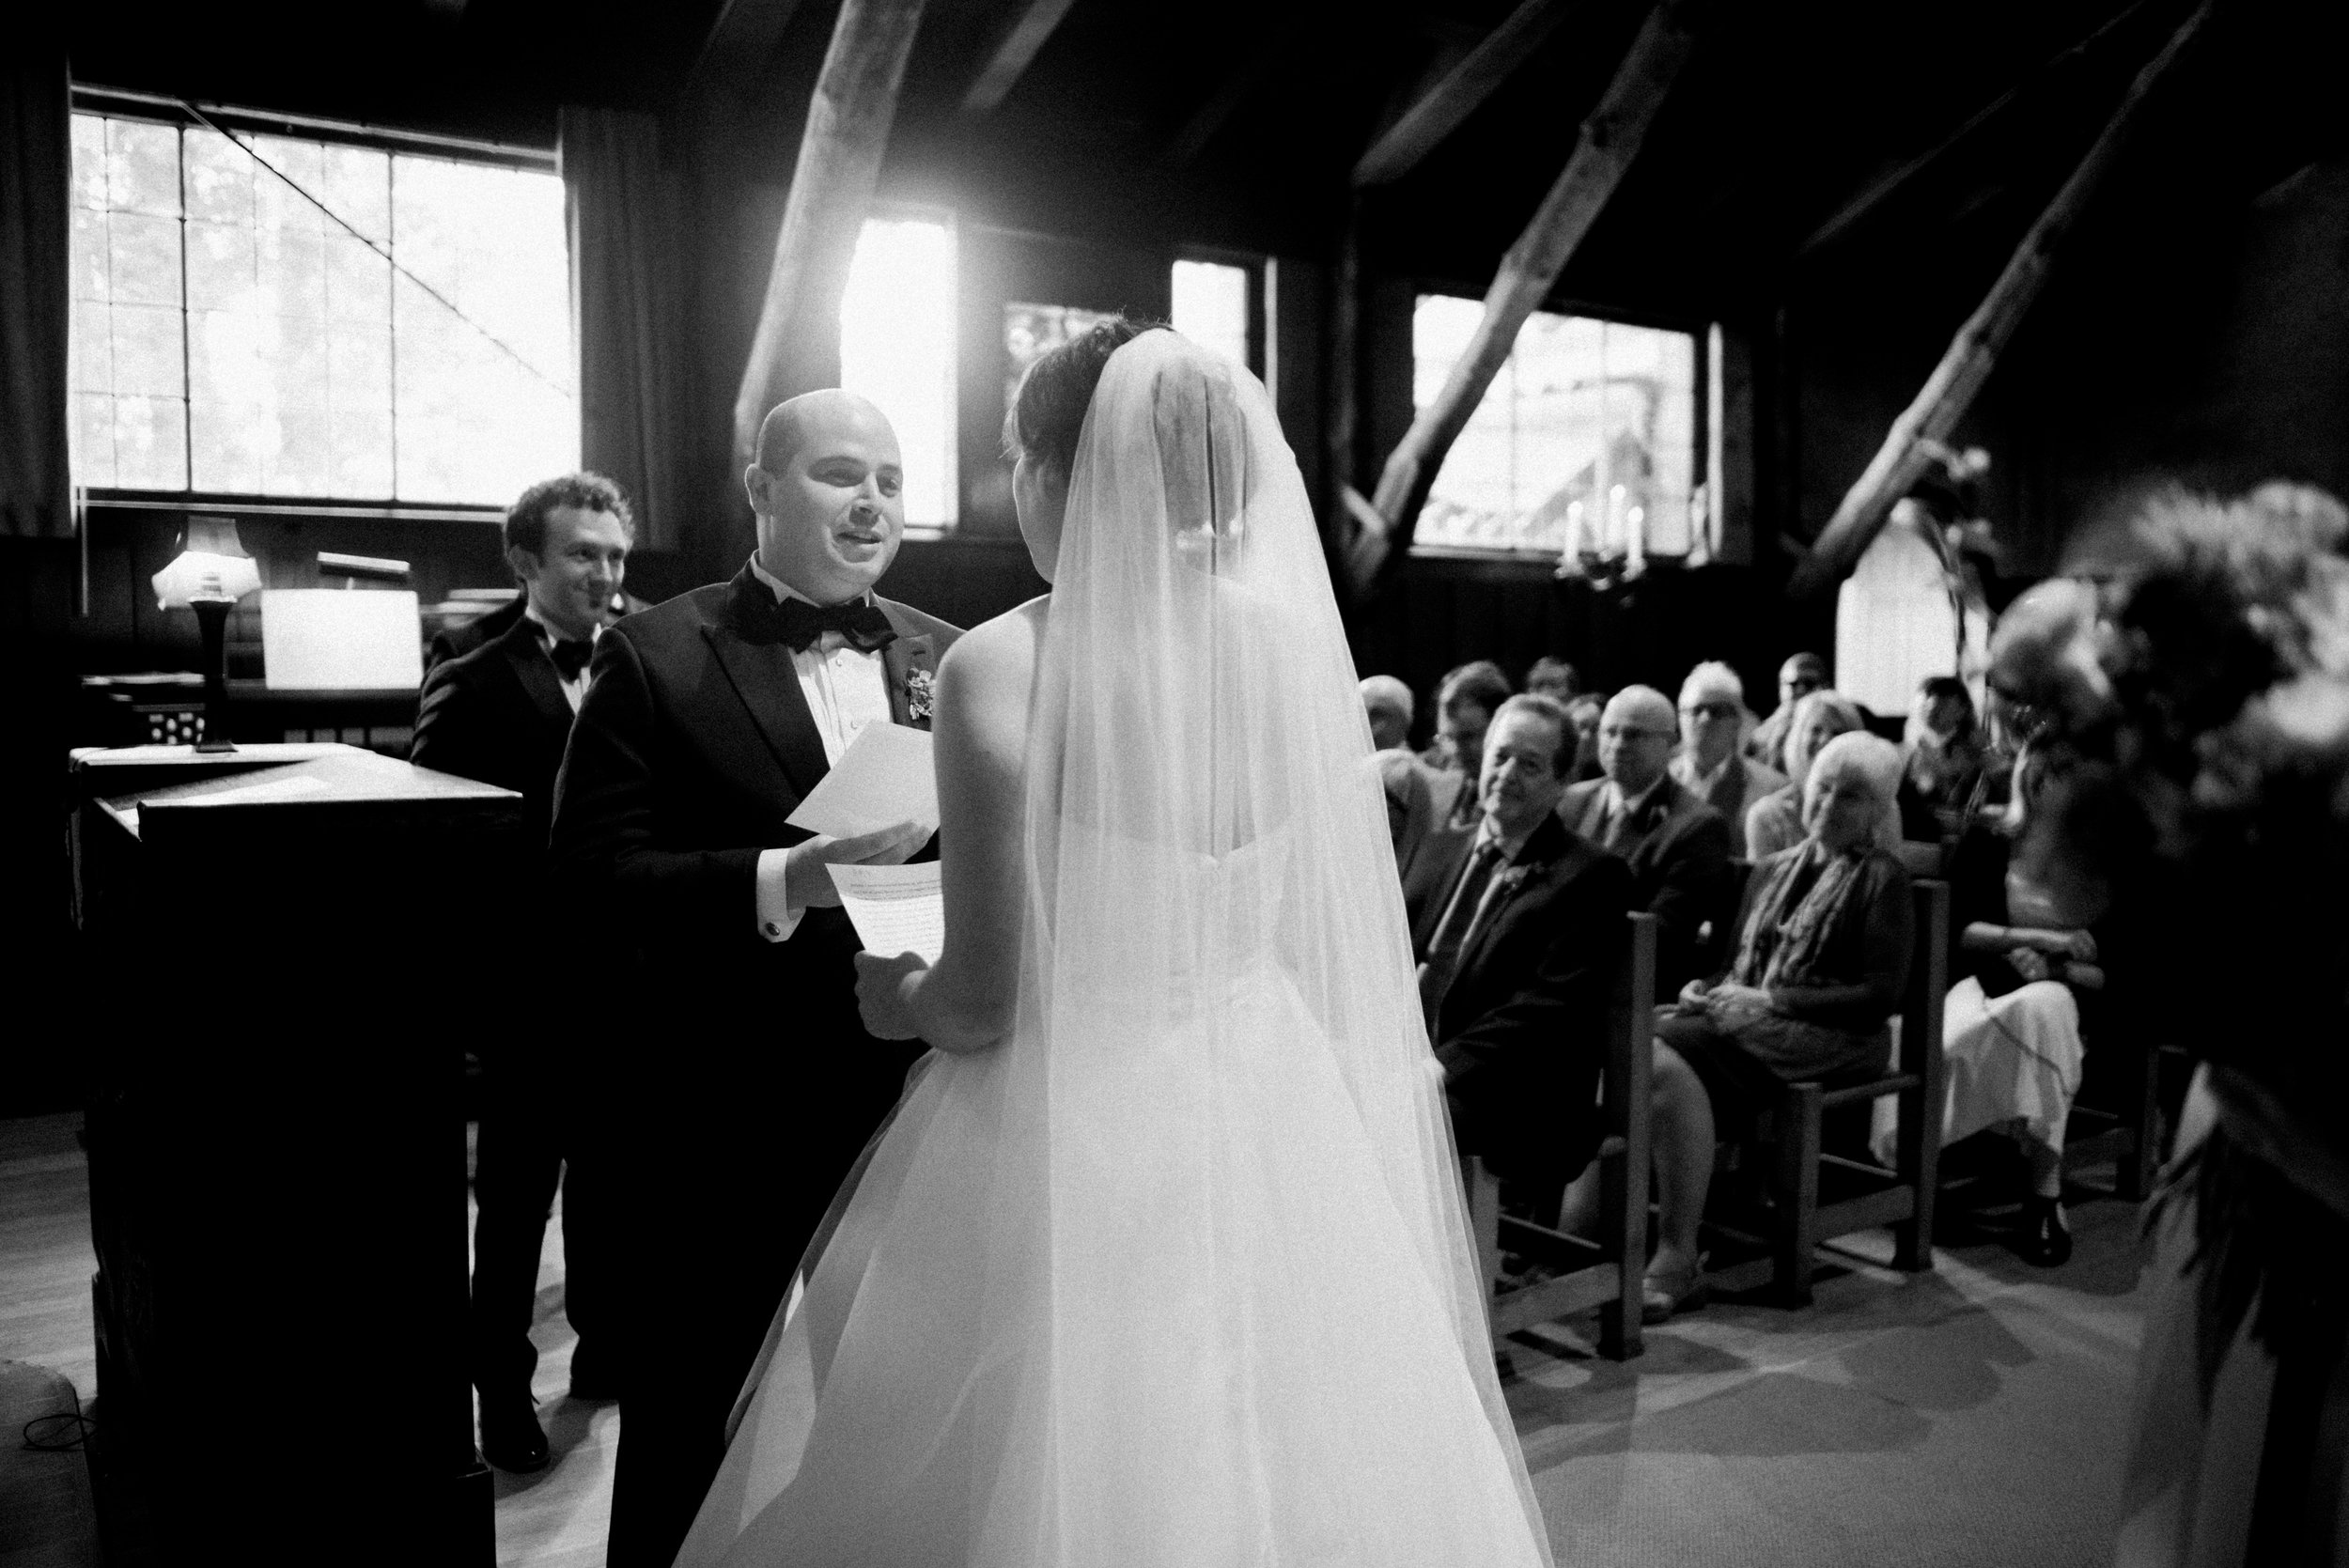 Swedenborgian Church Dogpatch Winery Wedding028.jpg